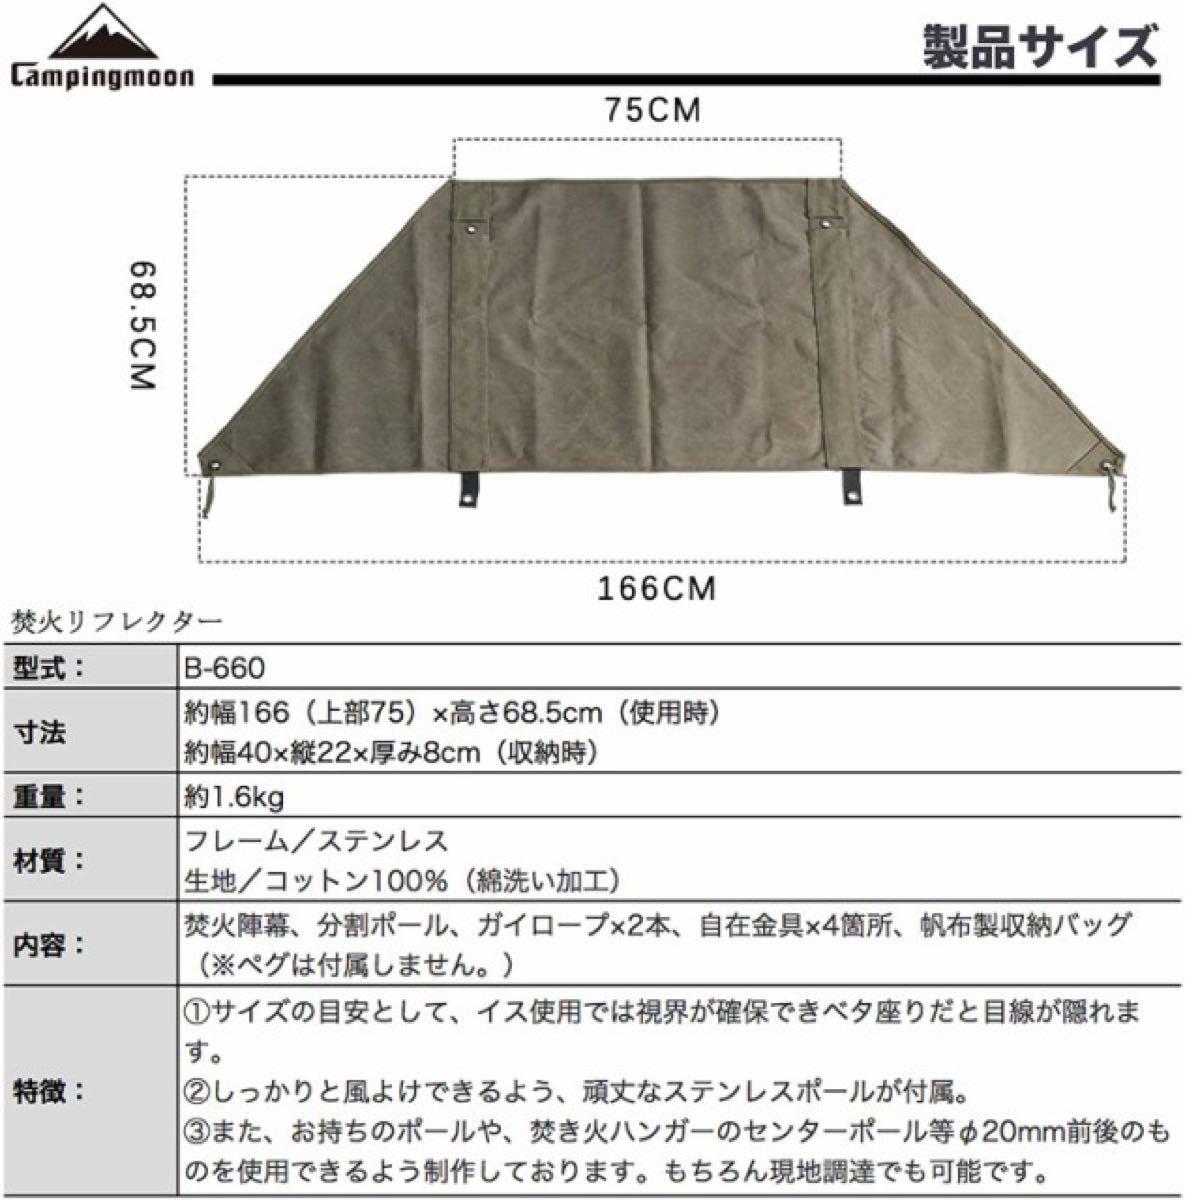 CAMPING MOON キャンピングムーン 焚火リフレクター 風よけ コットン風防 陣幕 帆布製 収納ケース付 B-660